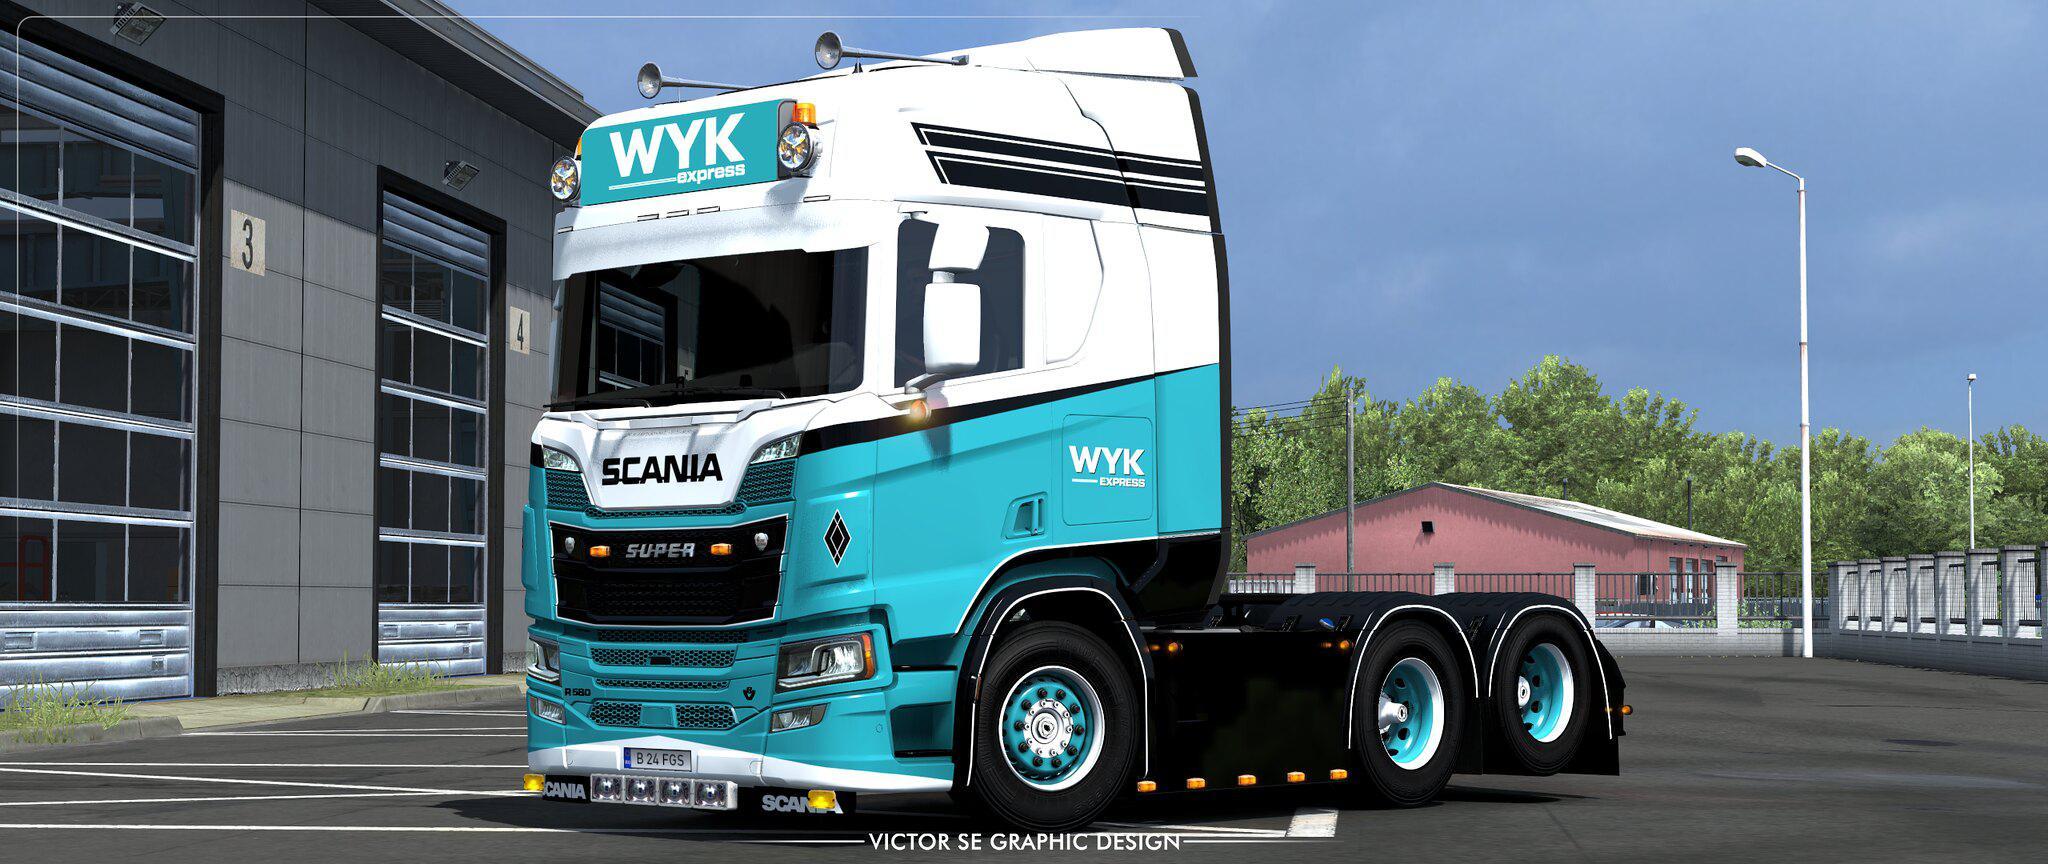 ETS2 - Scania R Highline 2016 WYK Express Skin V1.0 (1.36.x)